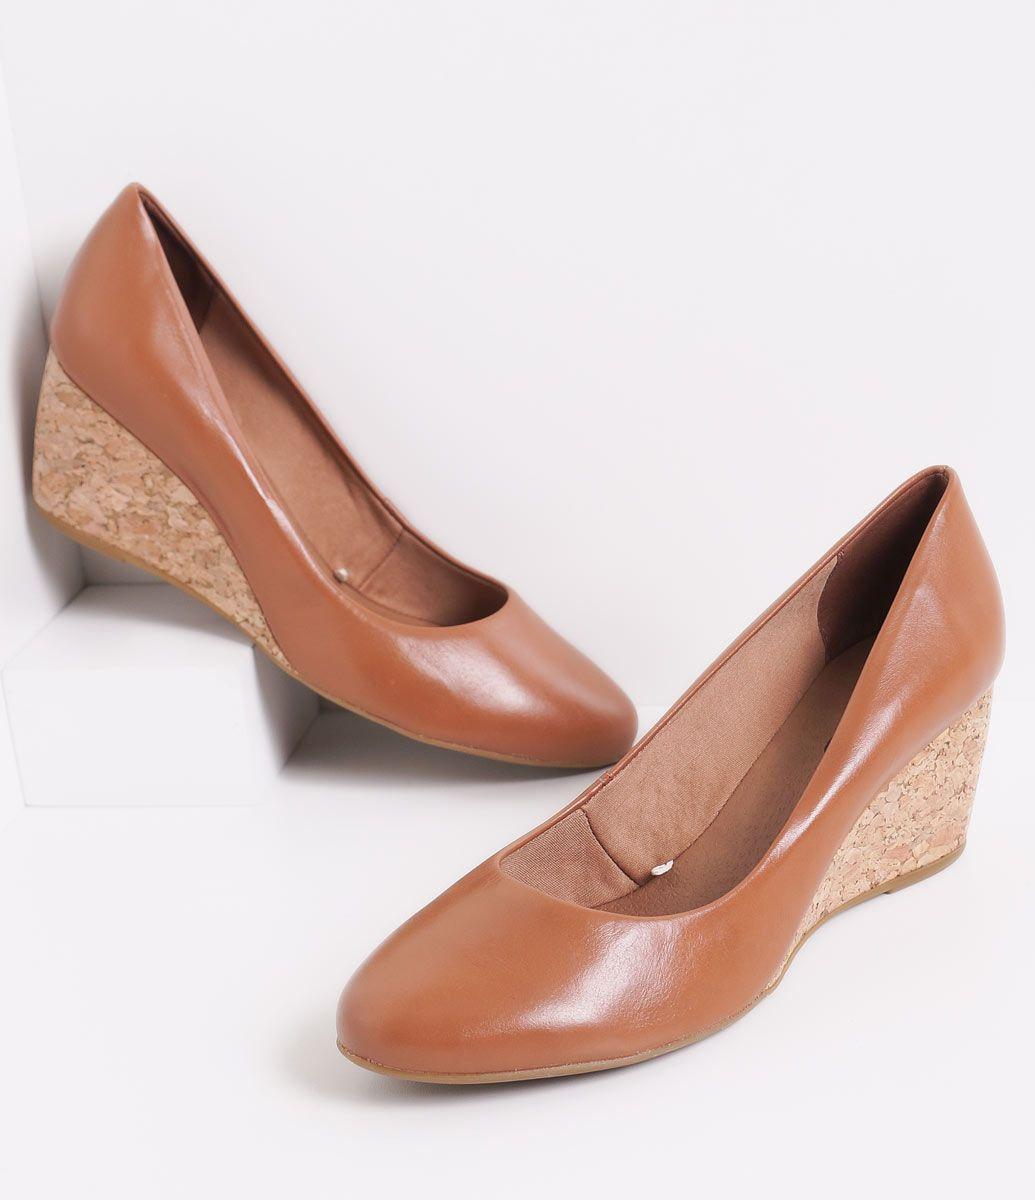 6159be70c Sapato Feminino Bottero Anabela em Couro - Lojas Renner